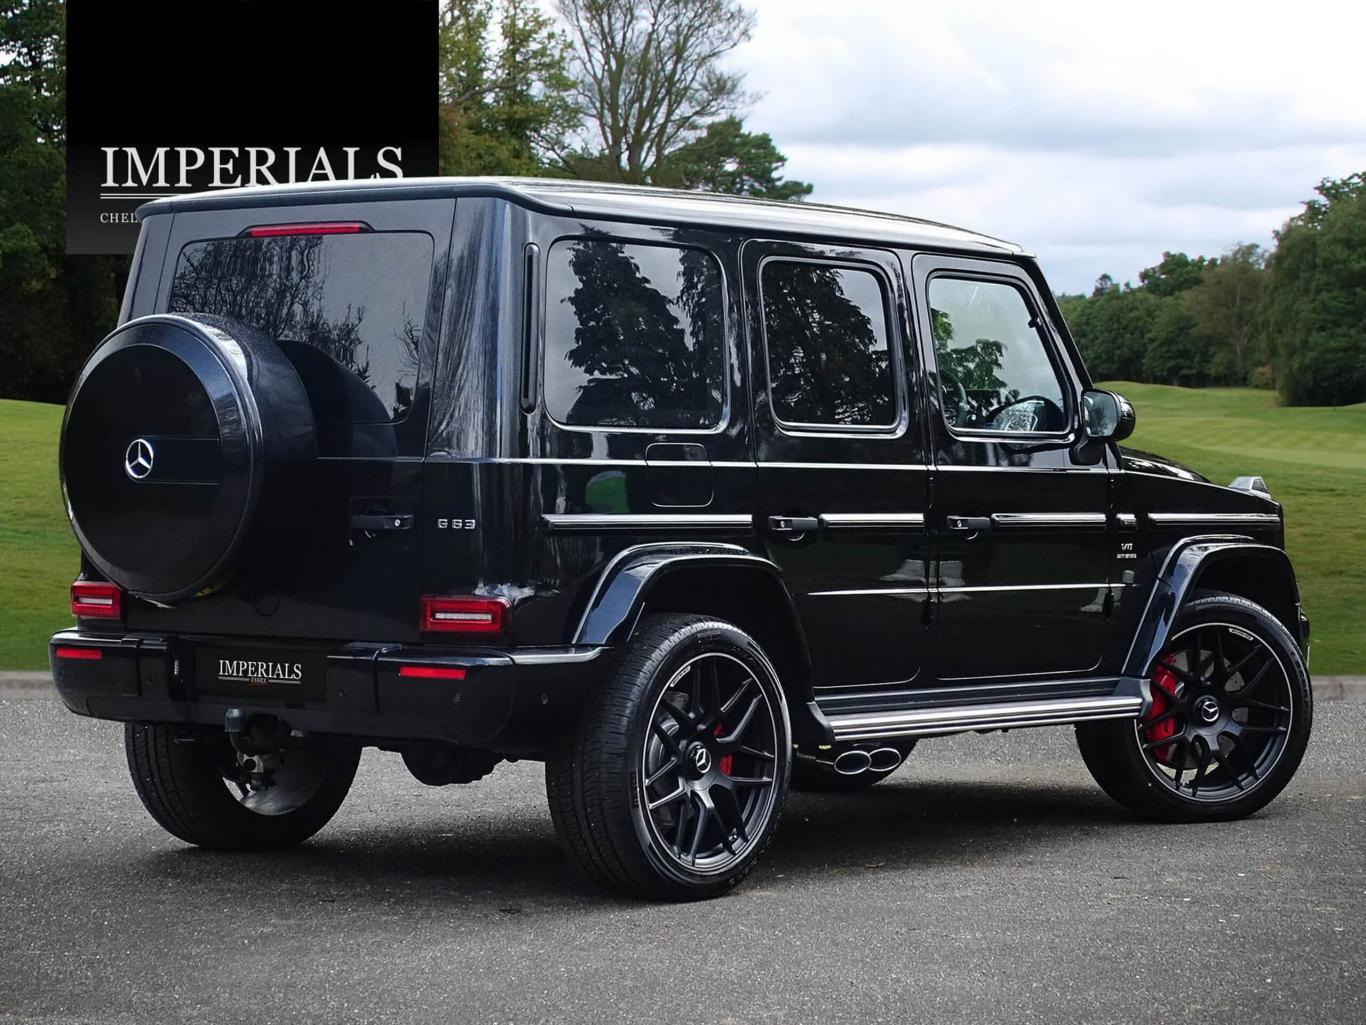 Mercedes Benz G63 Amg 40 V8 New Model Vat Q 9 Speed 4x4 Obsidian Black Metallic Automatic Petrol